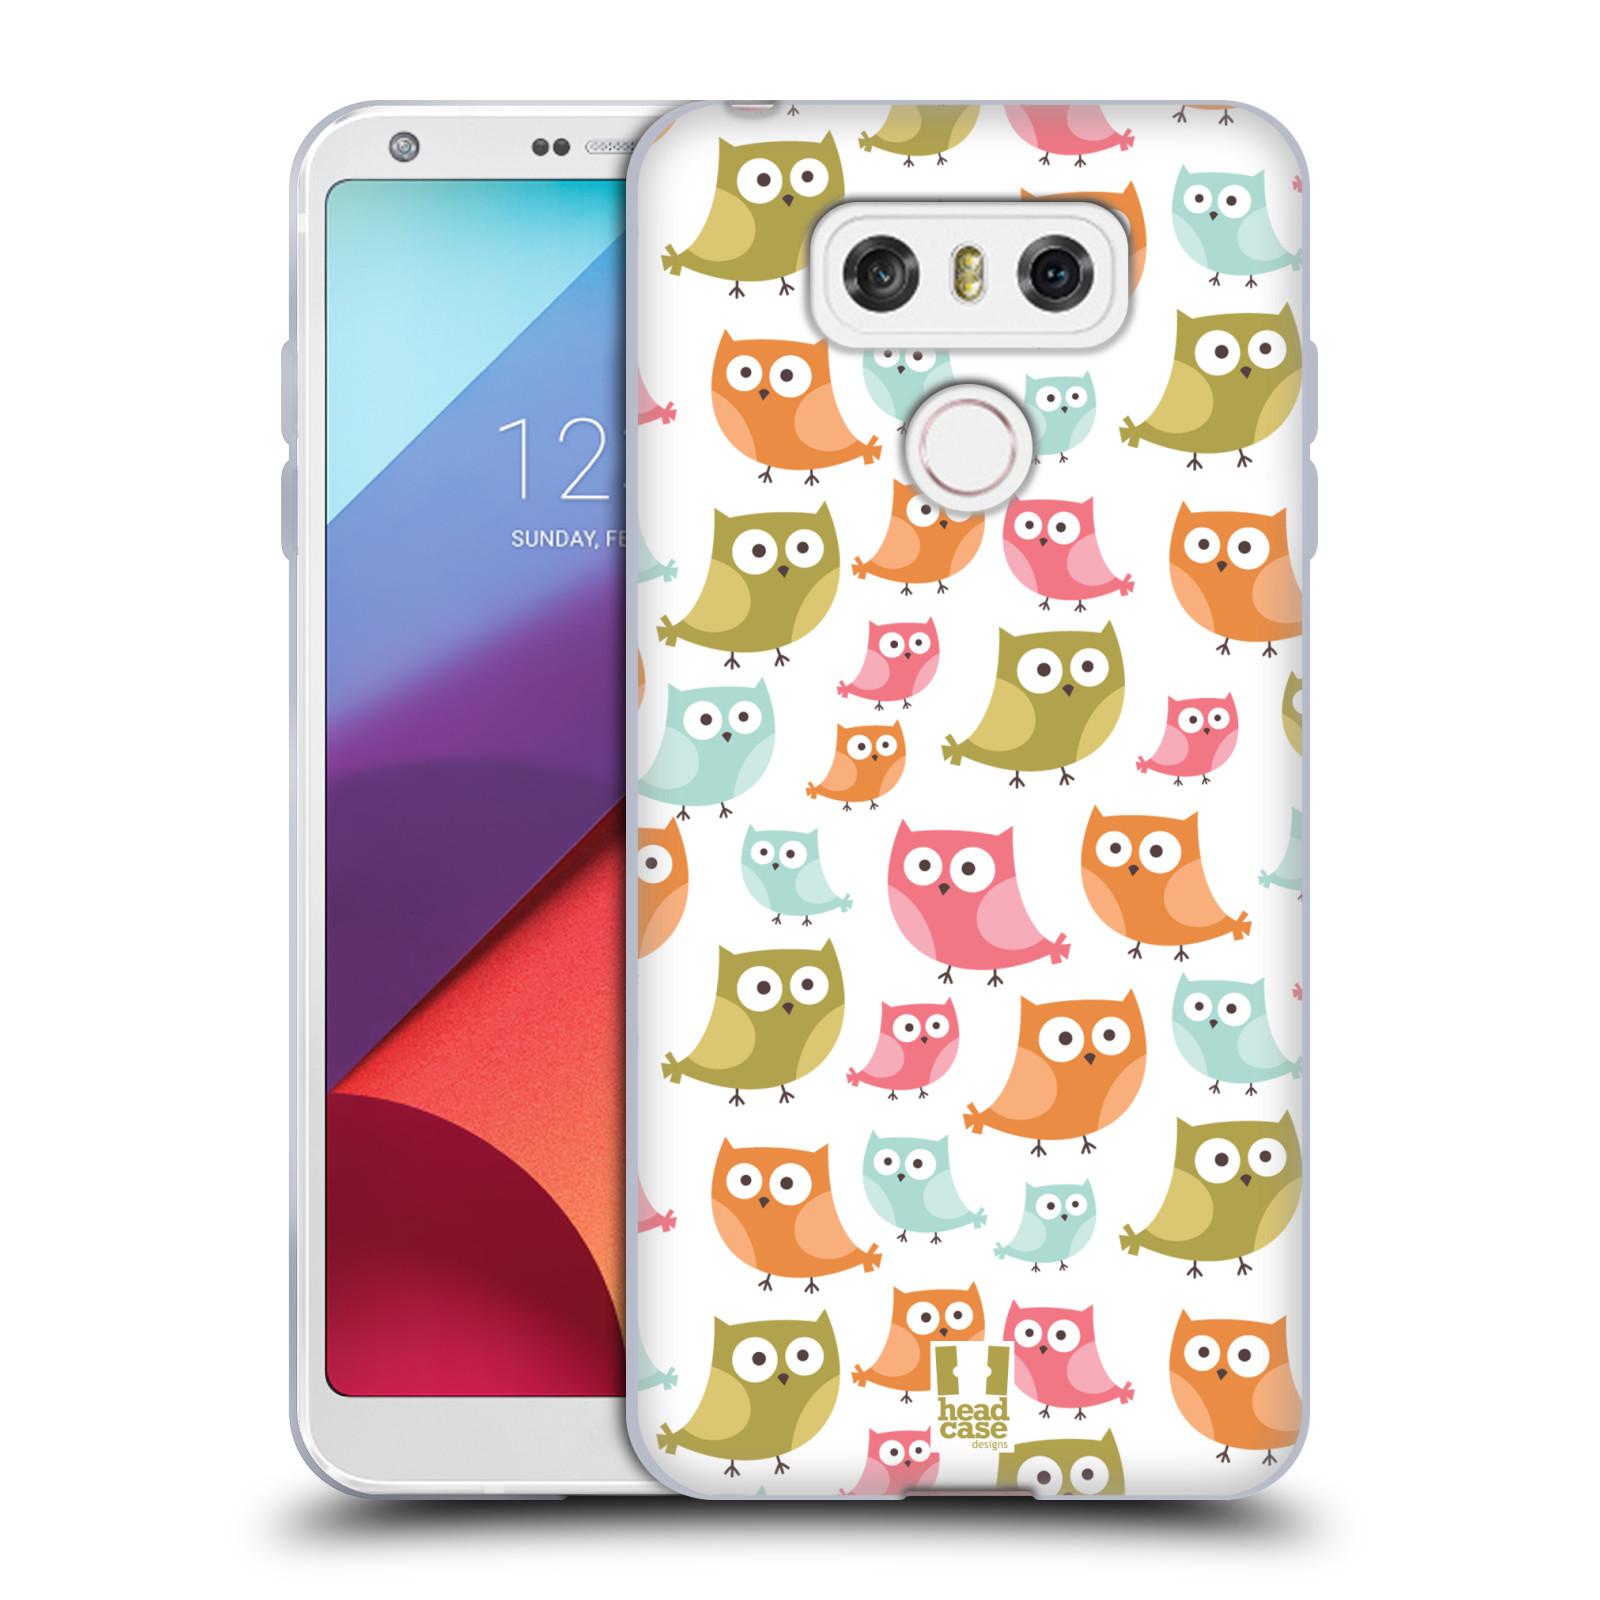 Silikonové pouzdro na mobil LG G6 - Head Case SOVIČKY ZMATENÉ (Silikonový kryt či obal na mobilní telefon LG G6 H870 / LG G6 Dual SIM H870DS)